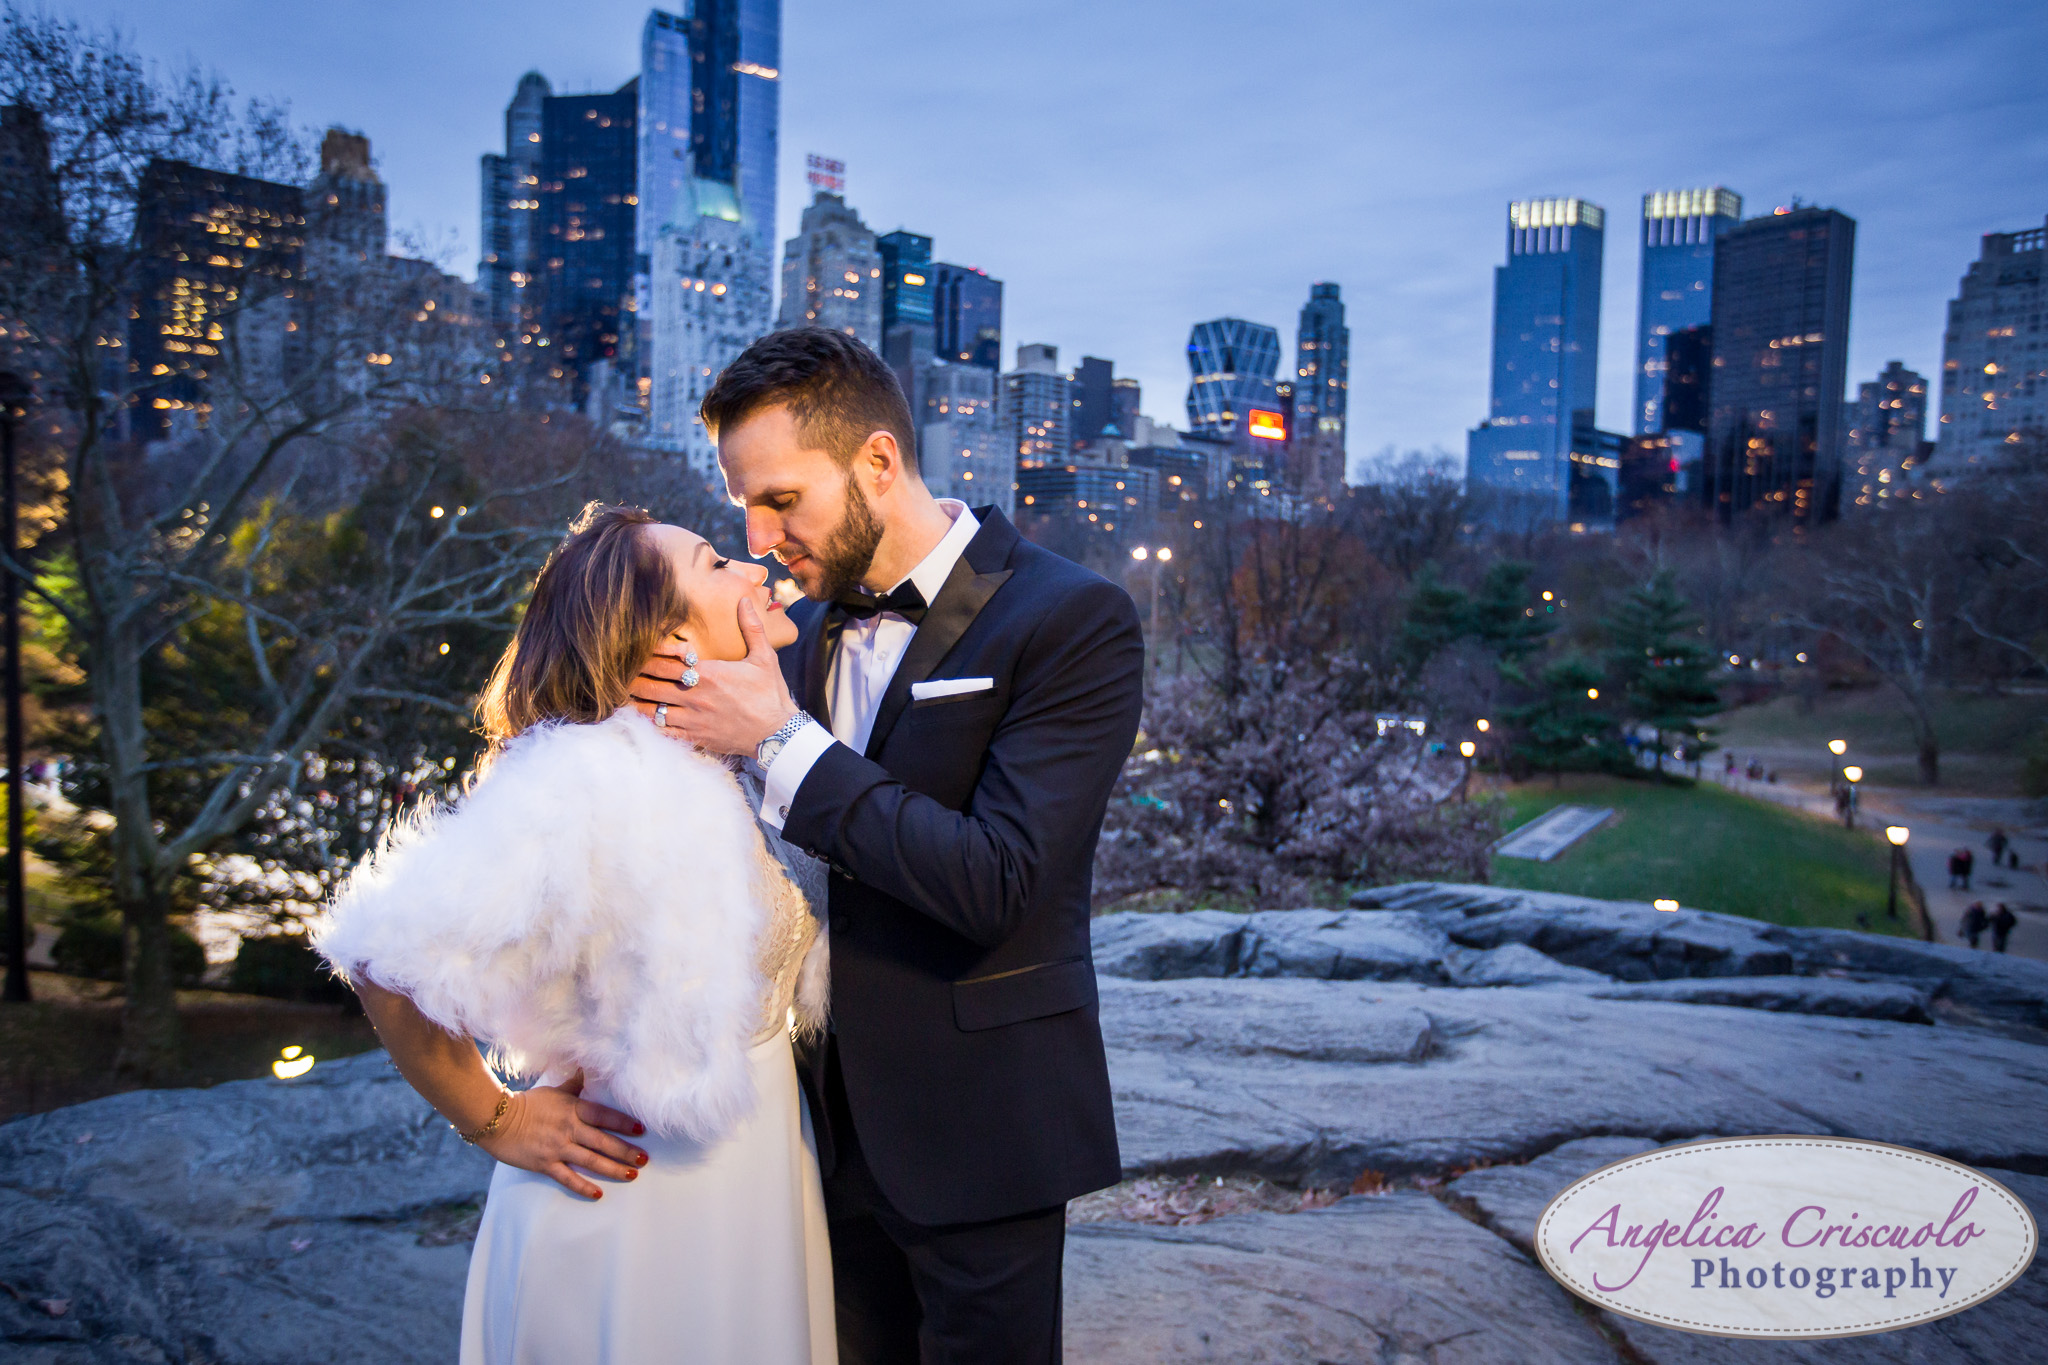 Central Park New York engagement couple wedding photos formal romantic skyline